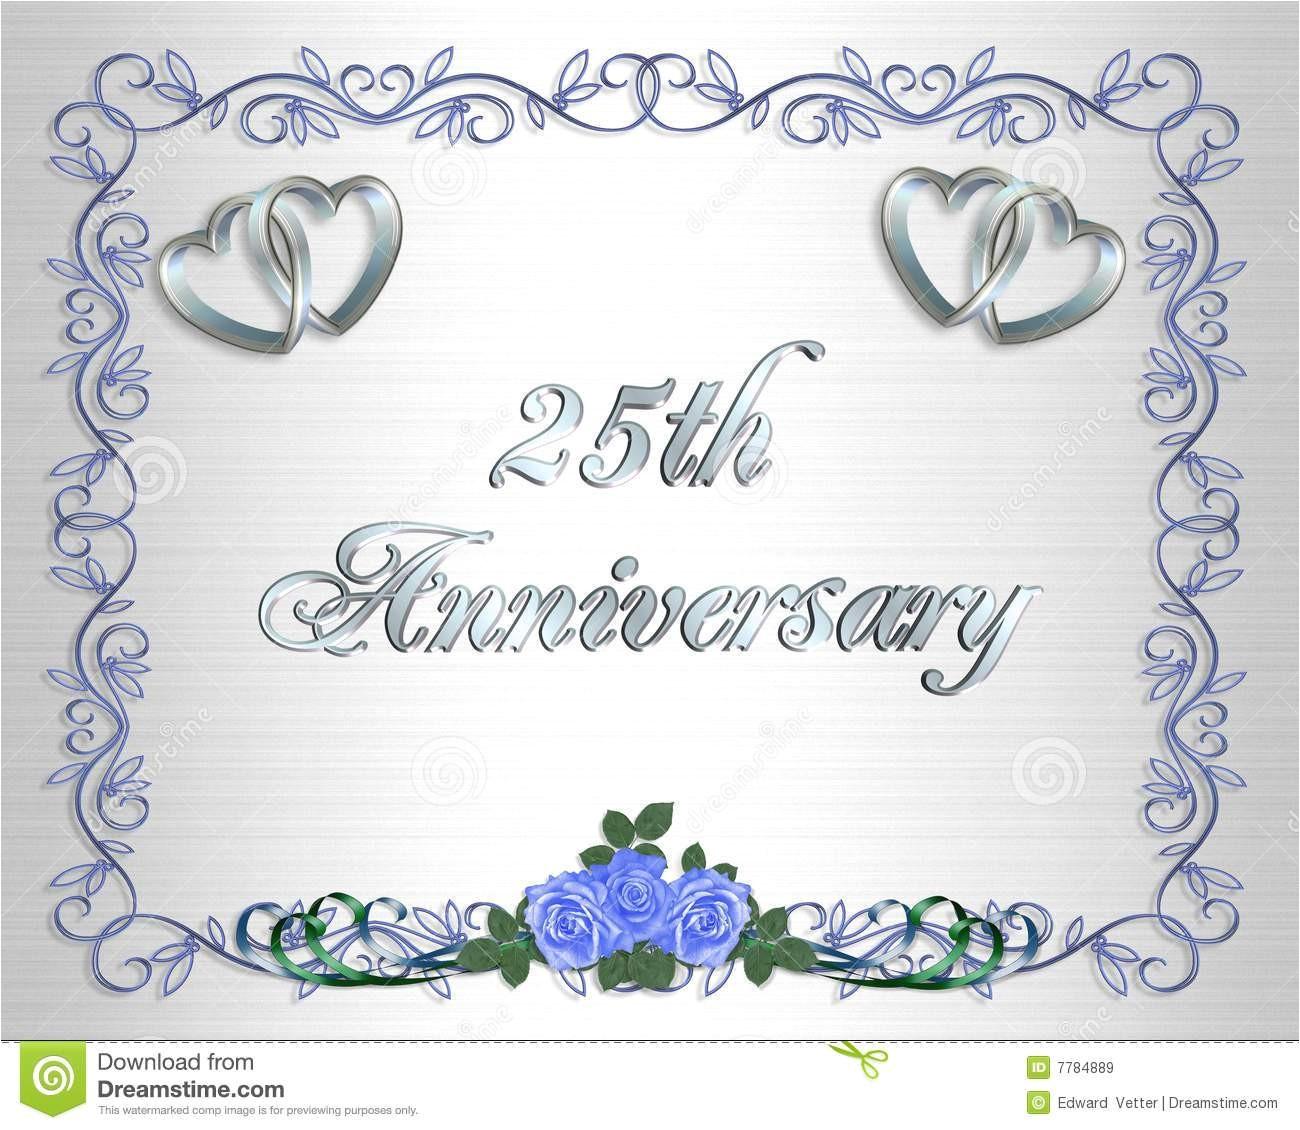 wedding anniversary invitation template free